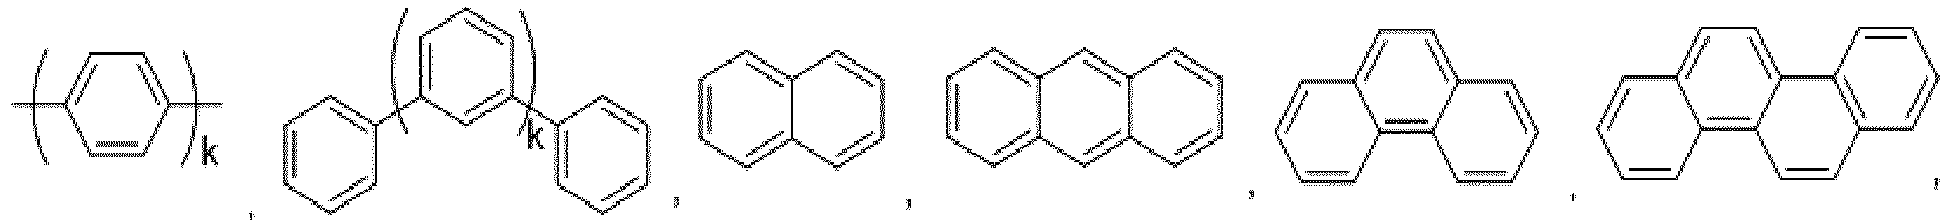 Figure imgb0875